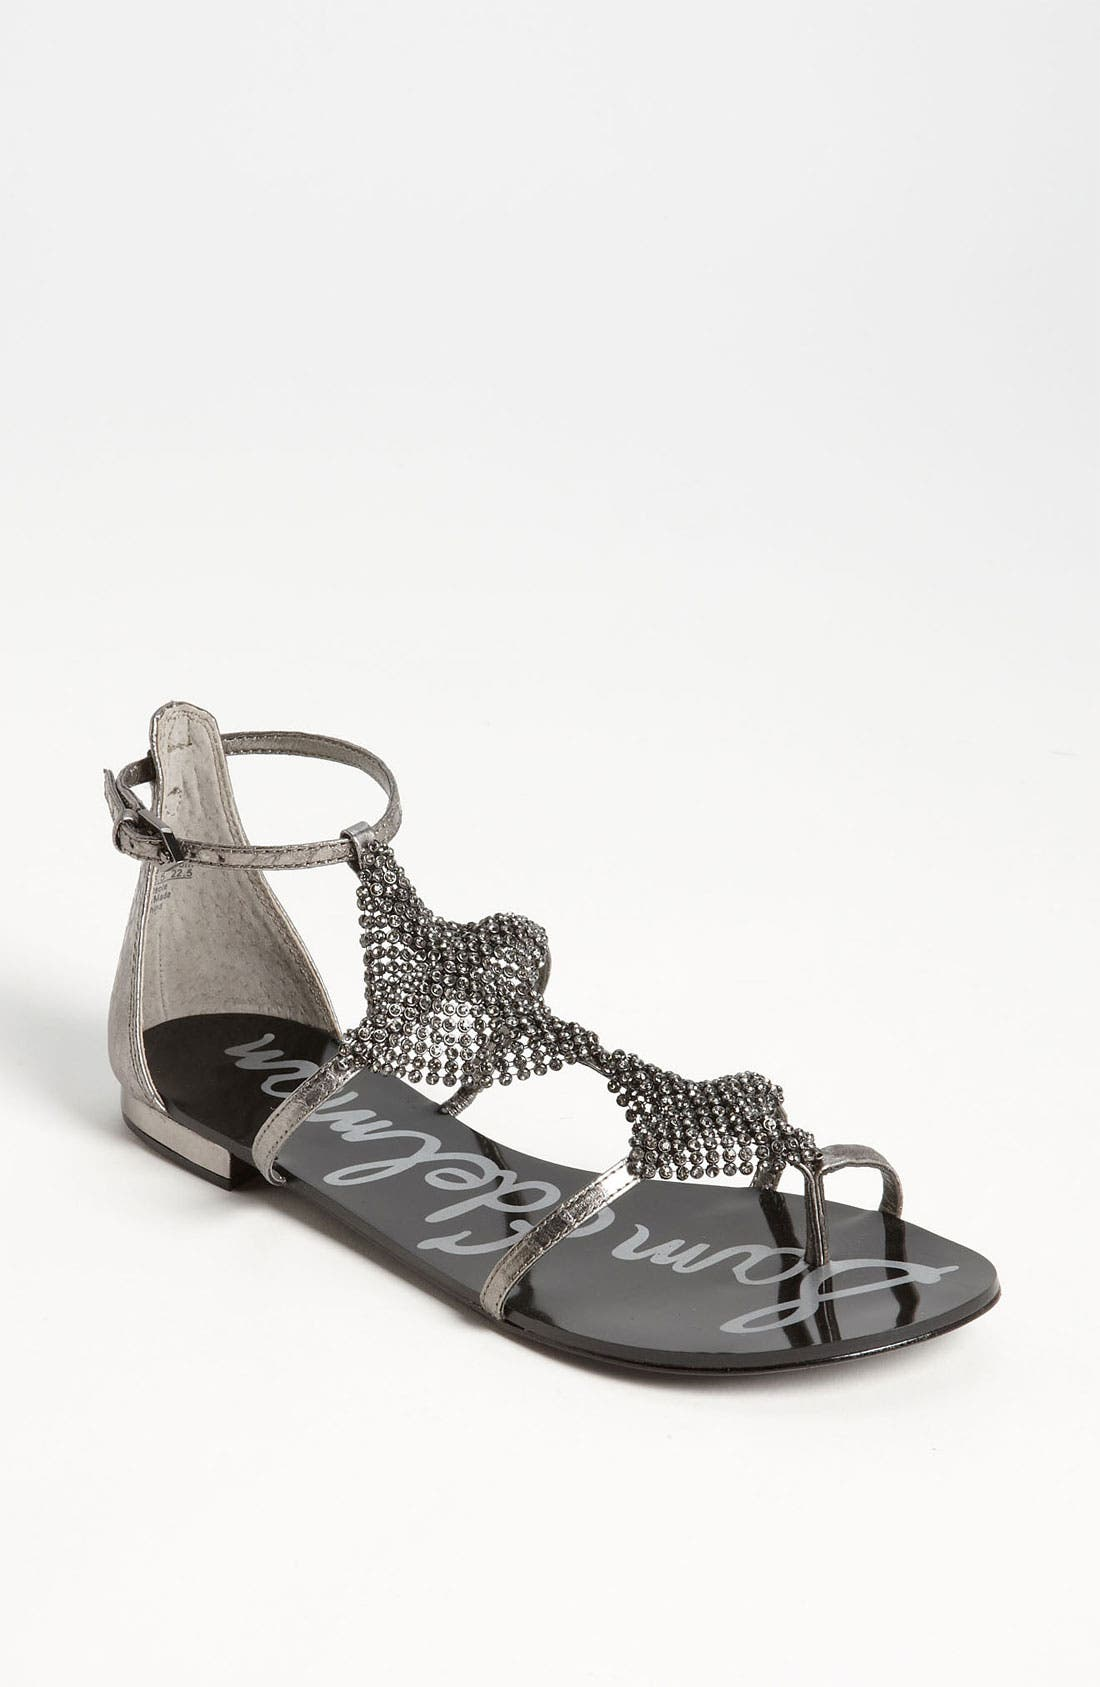 Main Image - Sam Edelman 'Tyra' Sandal